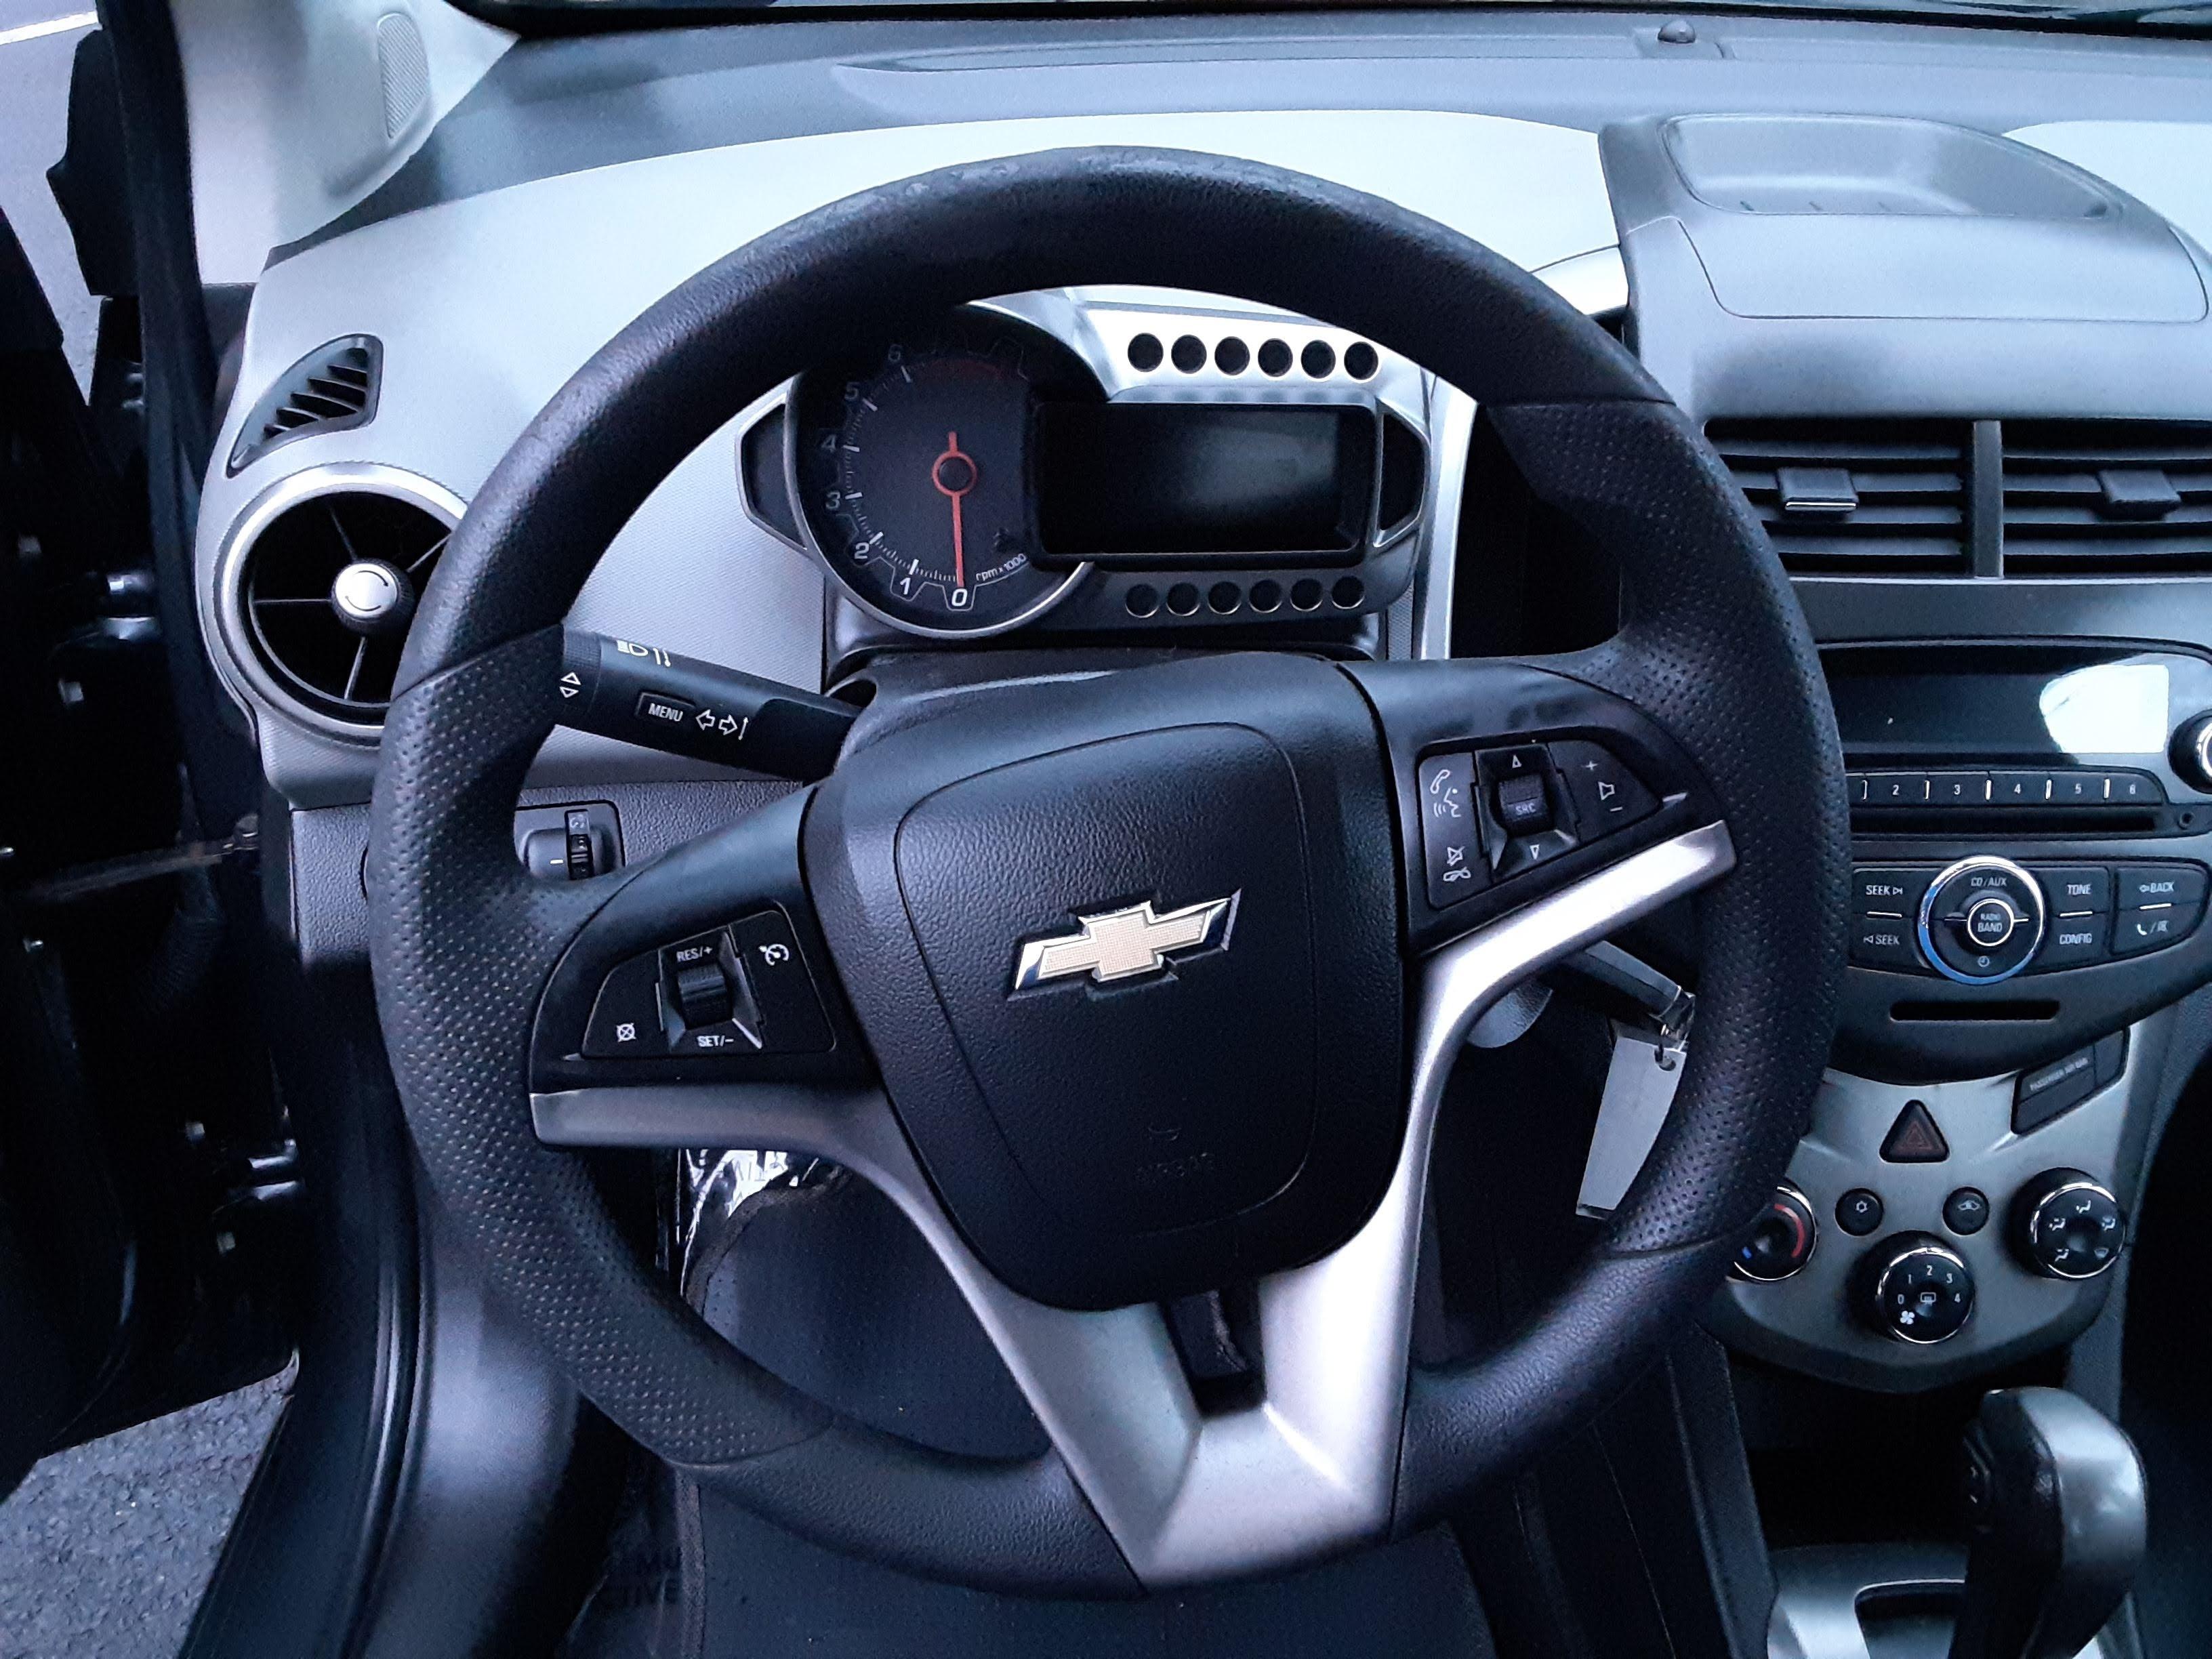 Wiper Blades Aero for Mitsubishi Verada KJ Sedan 3.5 2000-2003 ...